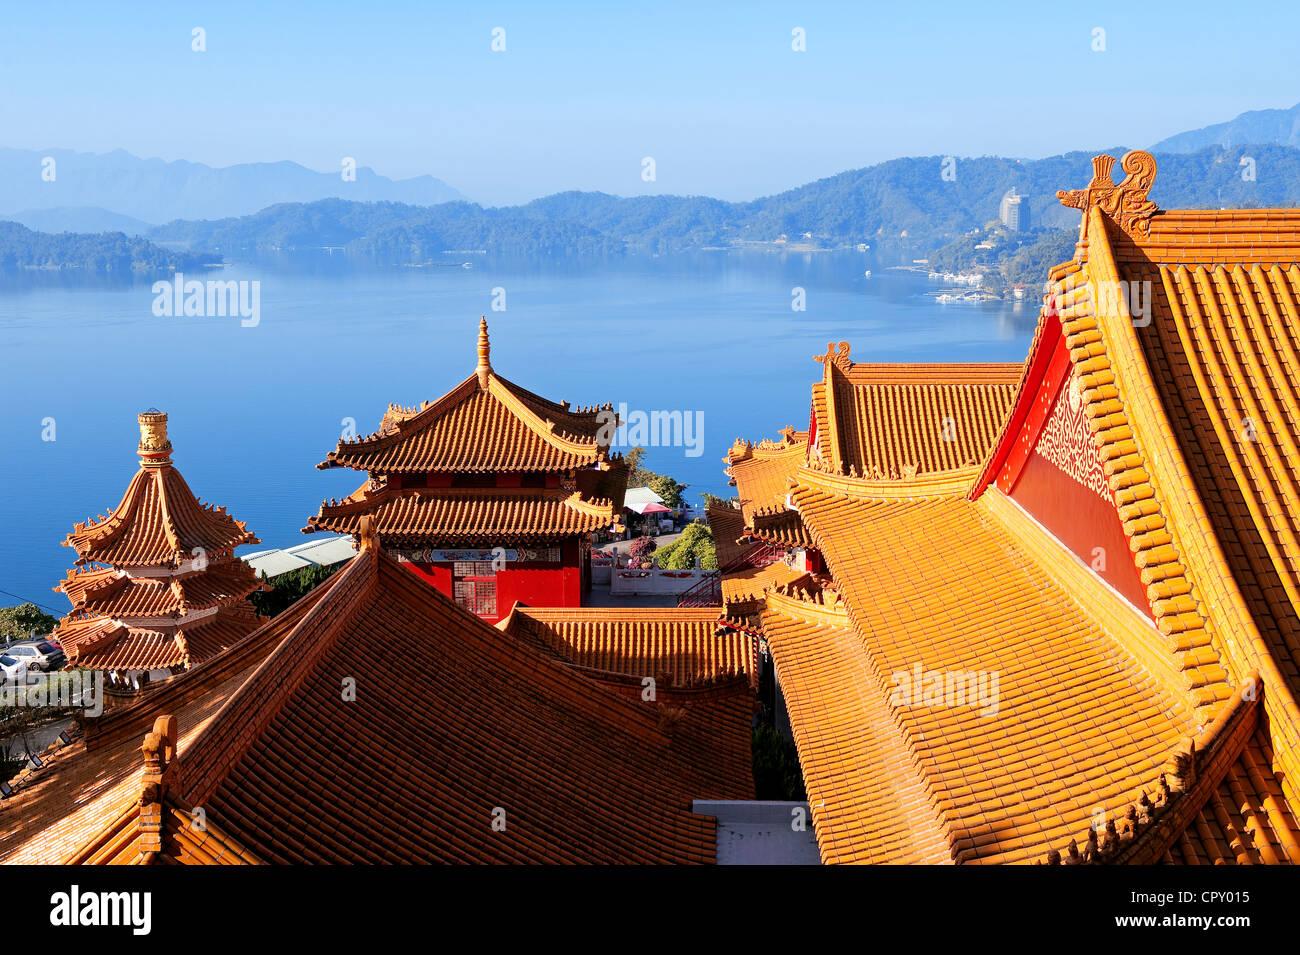 Taiwan, Nantou District, Sun Moon Lake Region, Confucius Temple (Wenwu Temple) - Stock Image